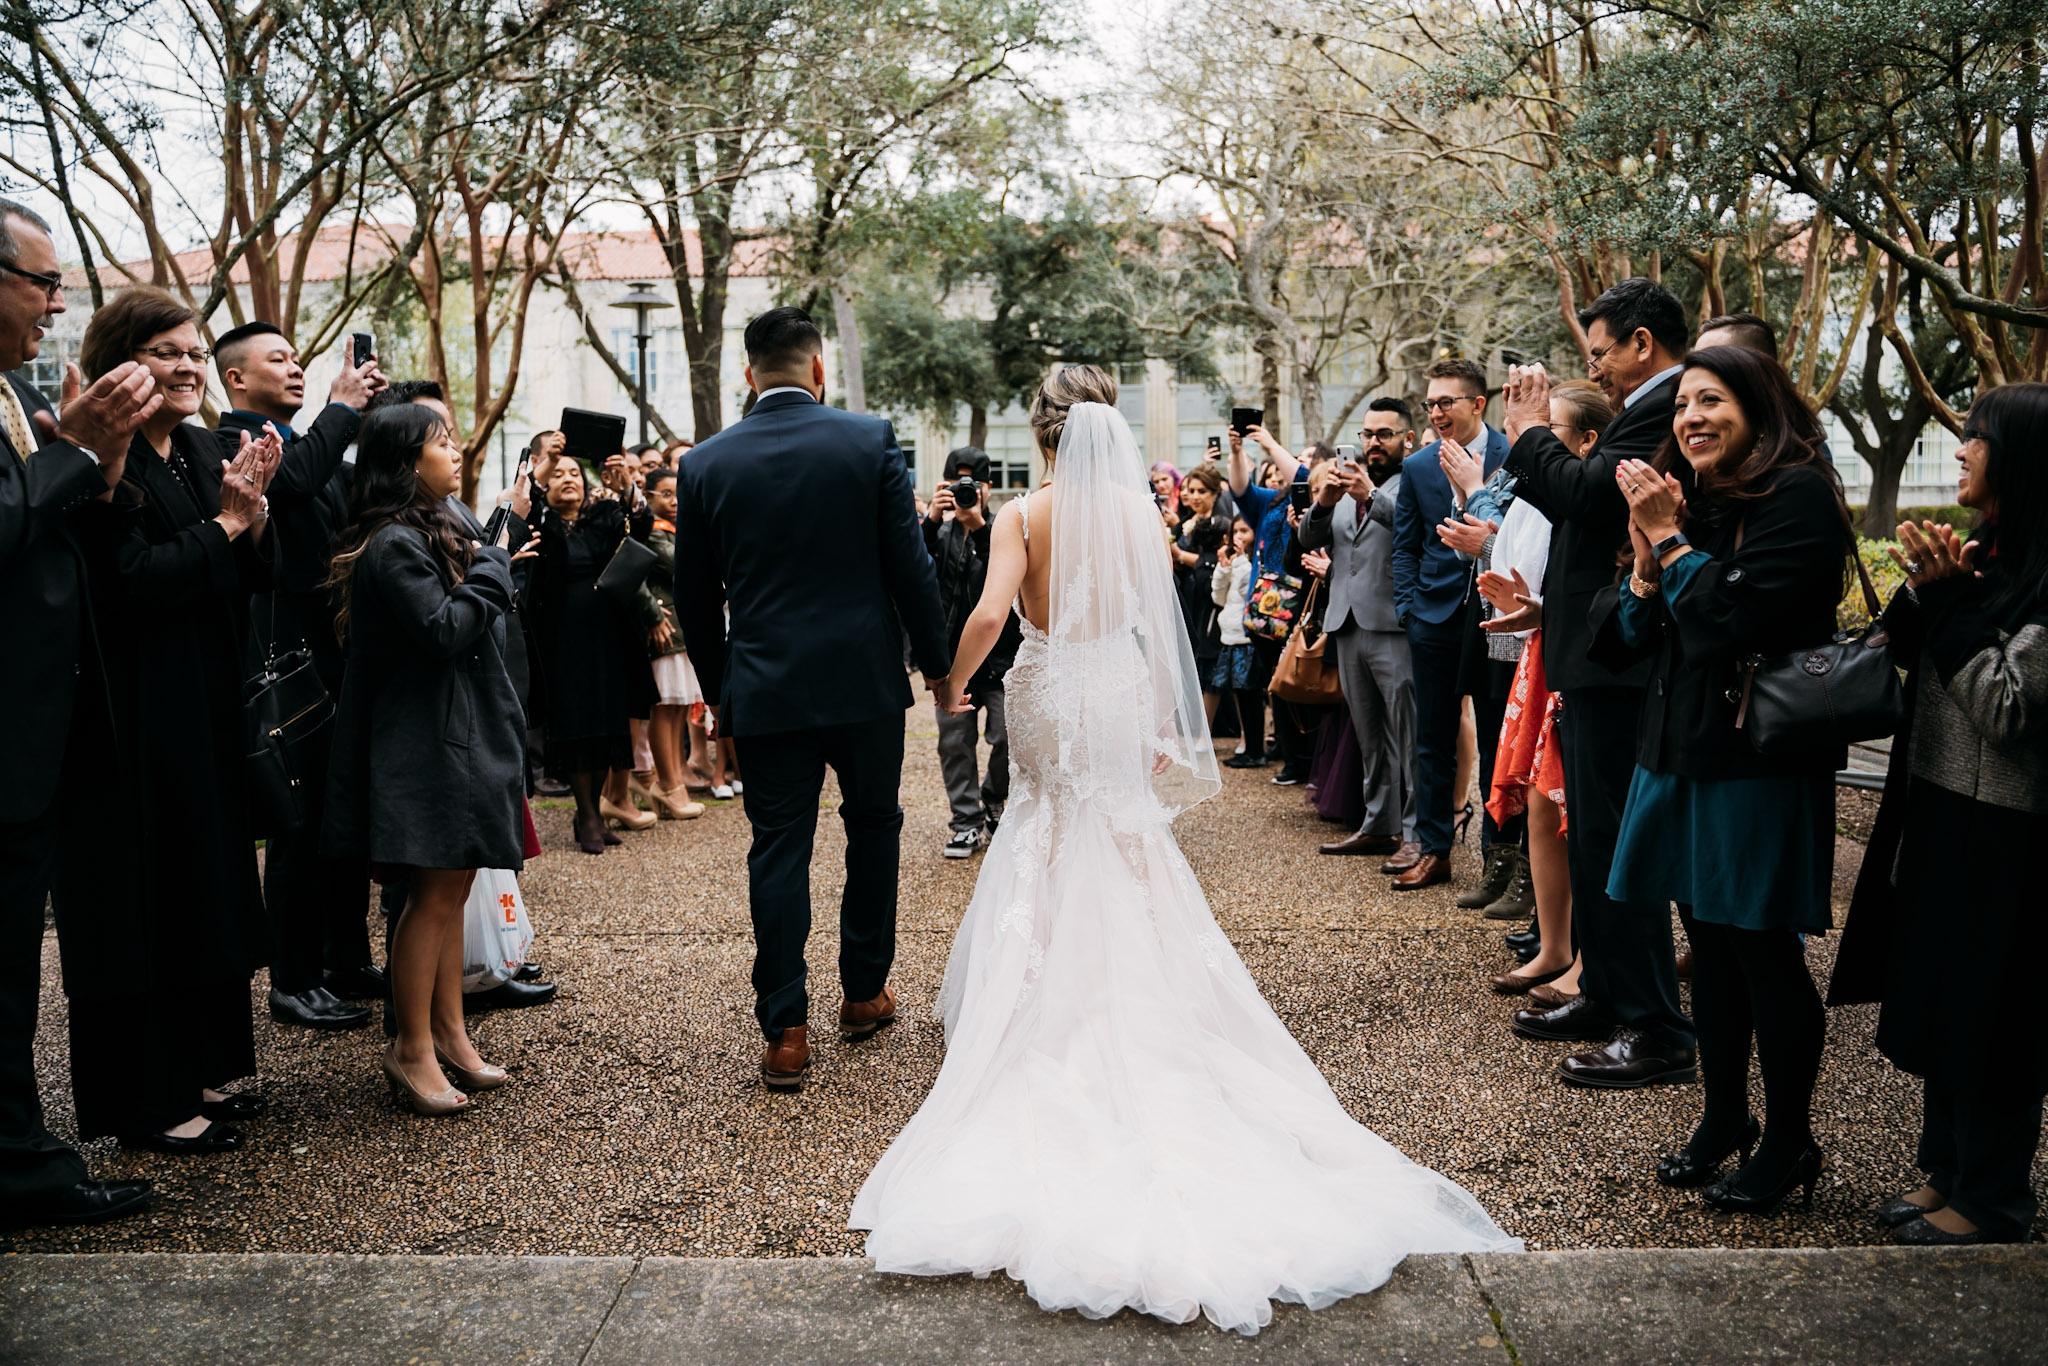 20190209-Cindy-Efren-Zapata-Wedding_CR35119.JPG